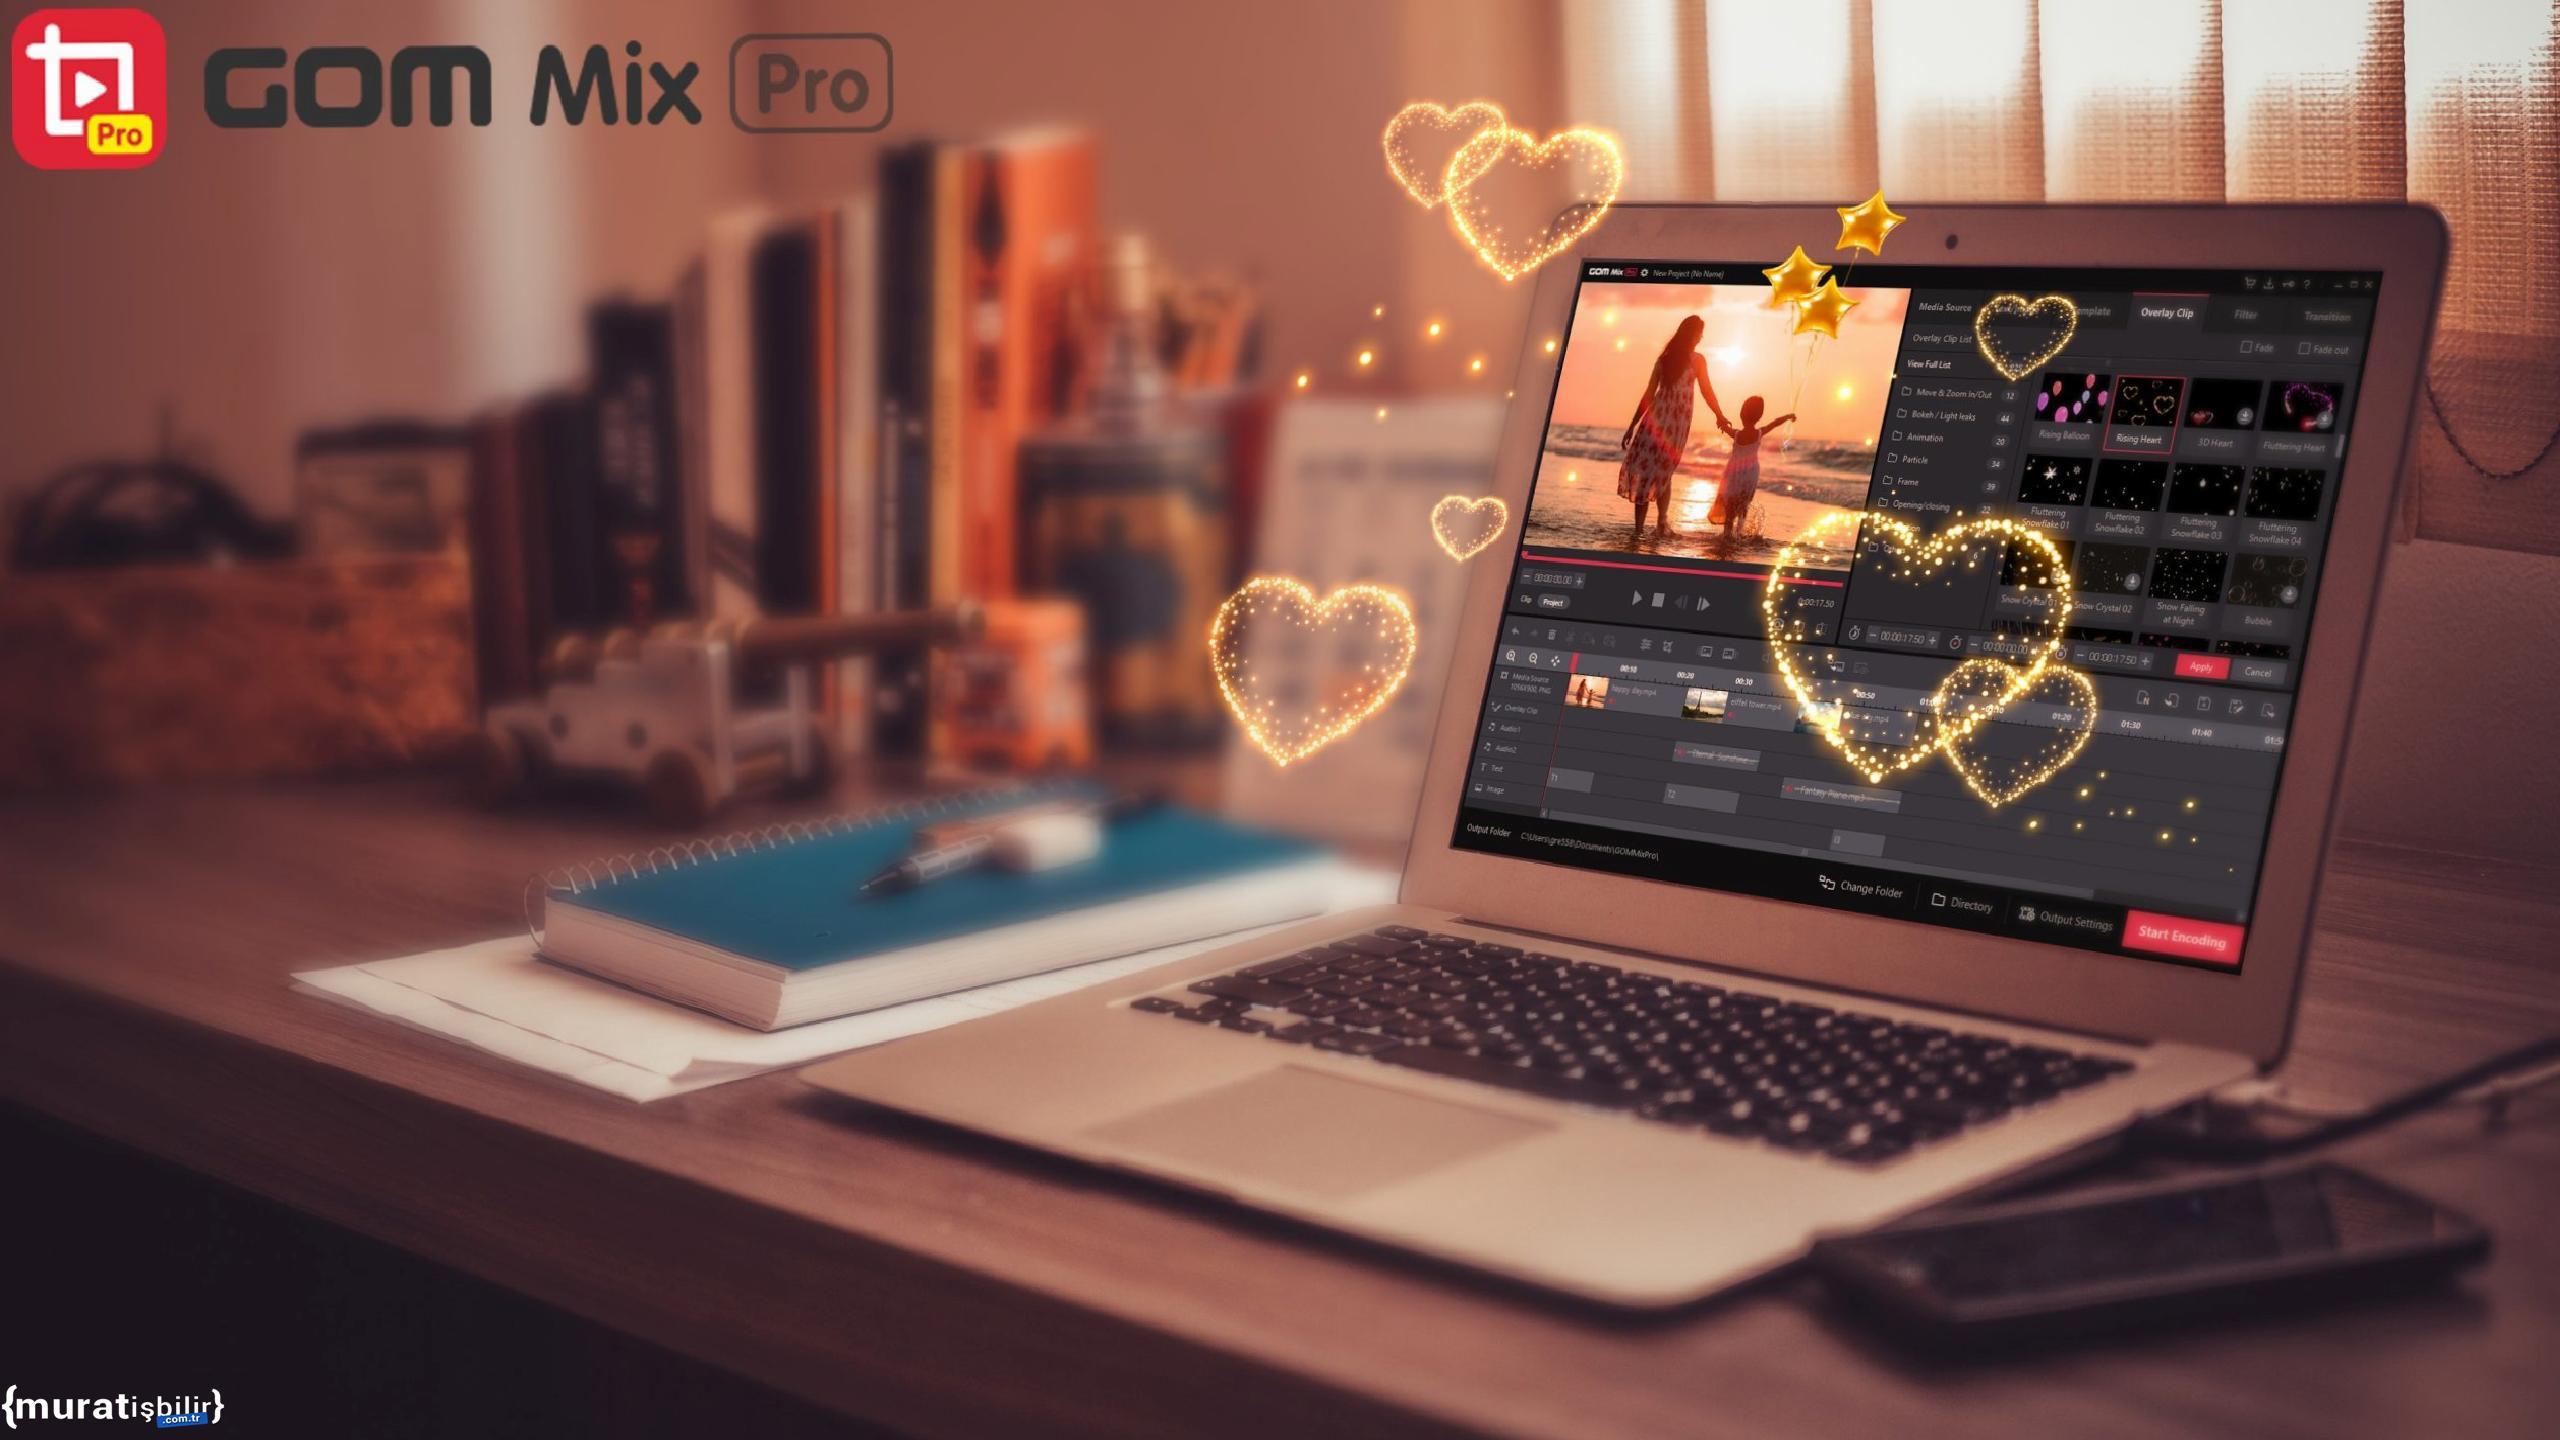 Basit Arayüzlü Video Düzenleme Yazılımı: GOM Mix Pro